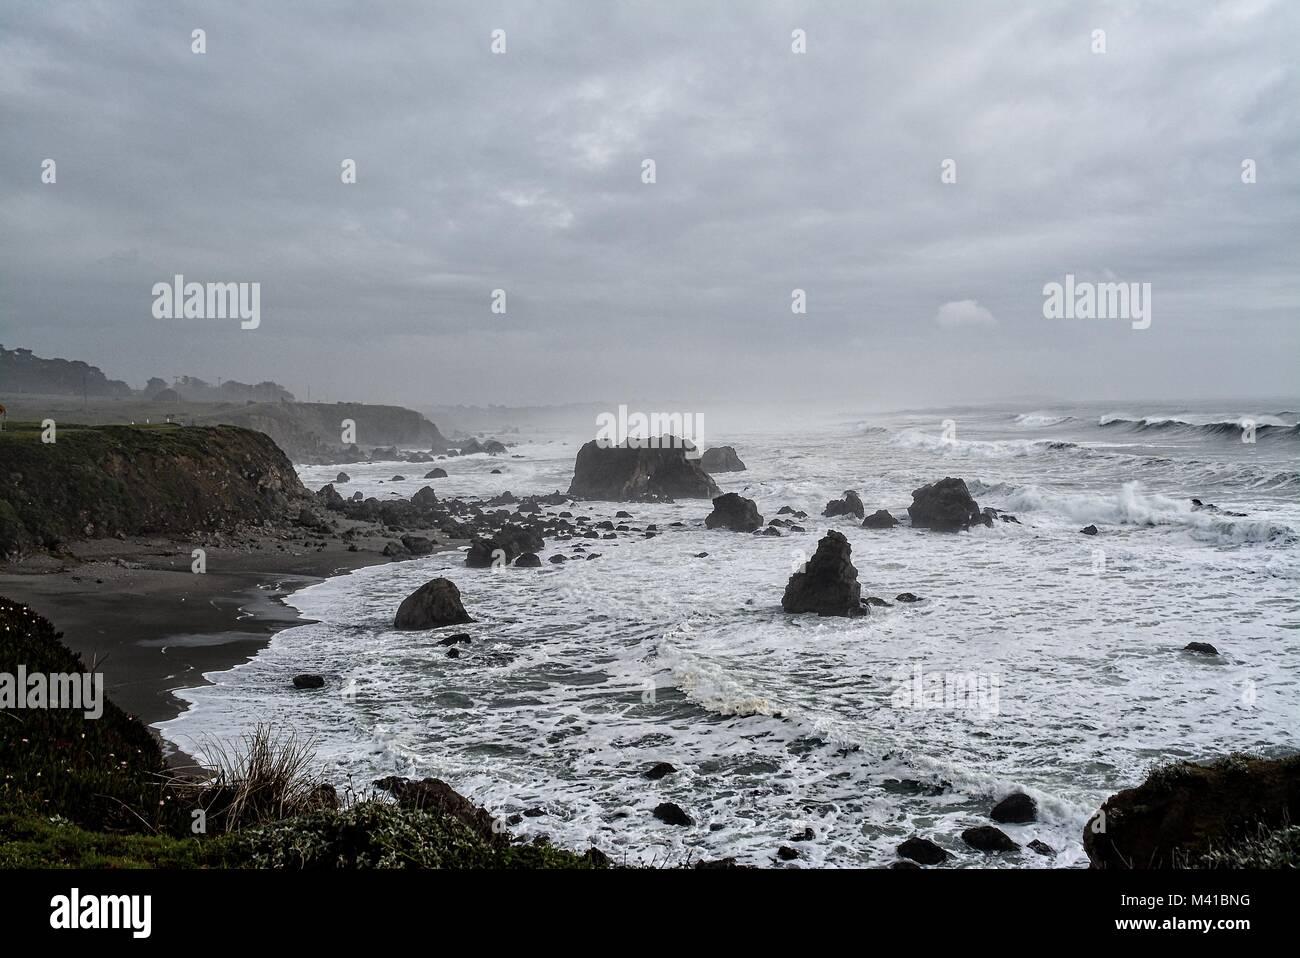 Bodega Bay - California - rainy day with many clouds - Stock Image